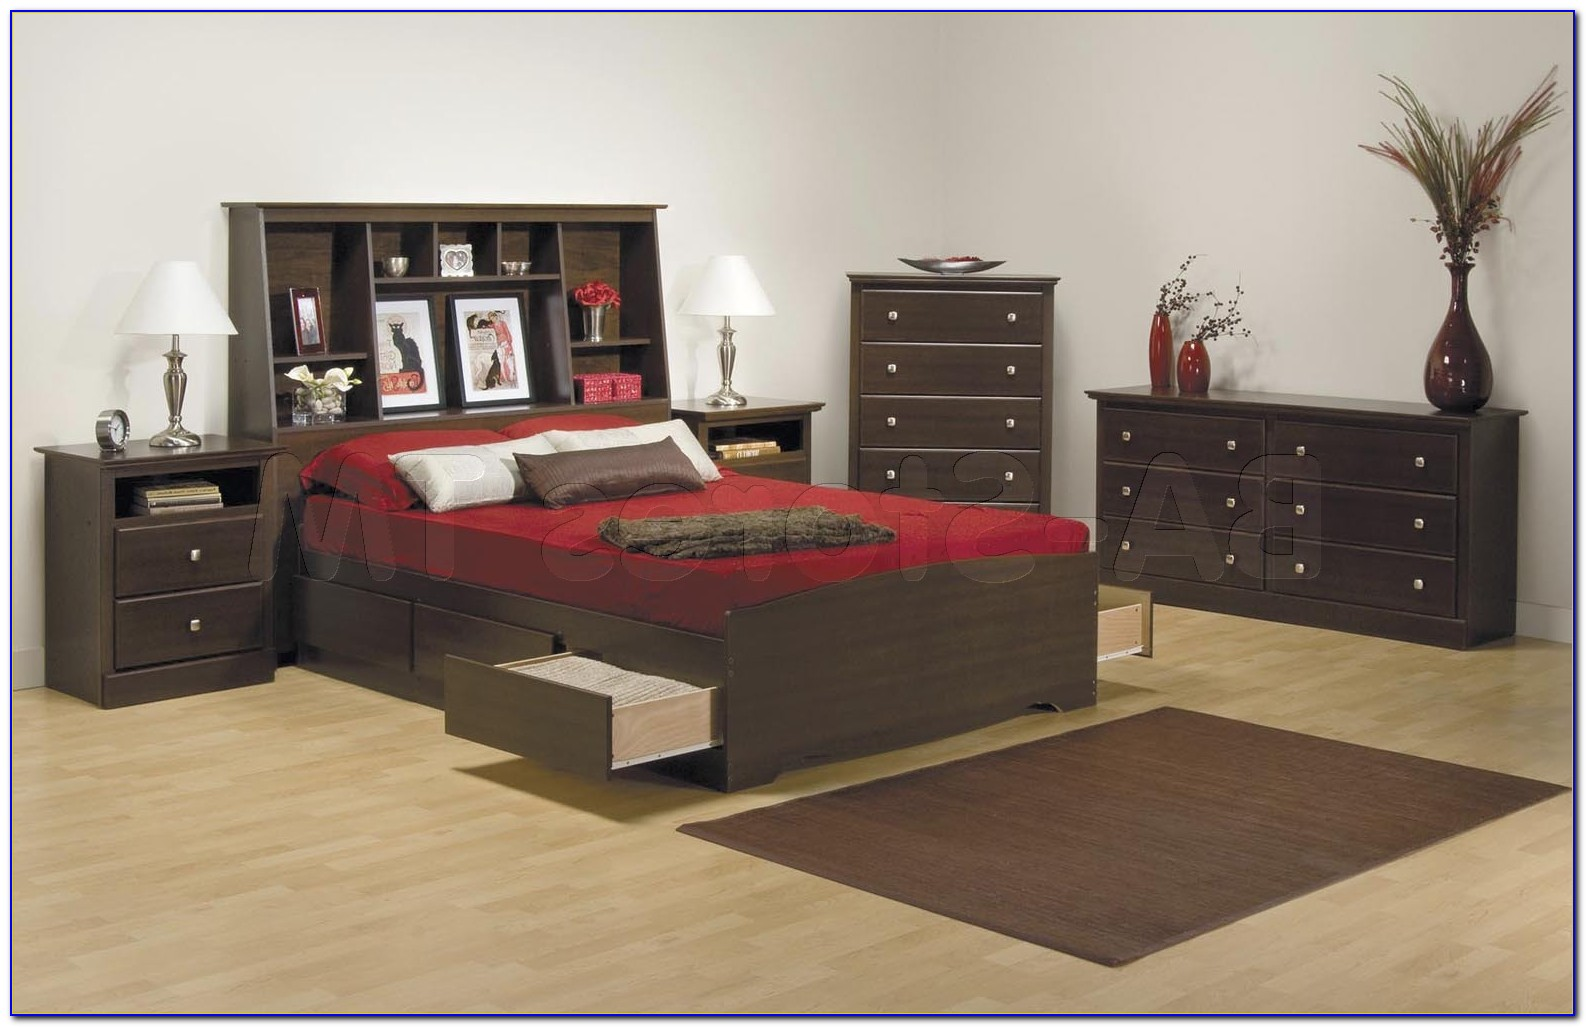 King Size Bookcase Headboard Bedroom Sets